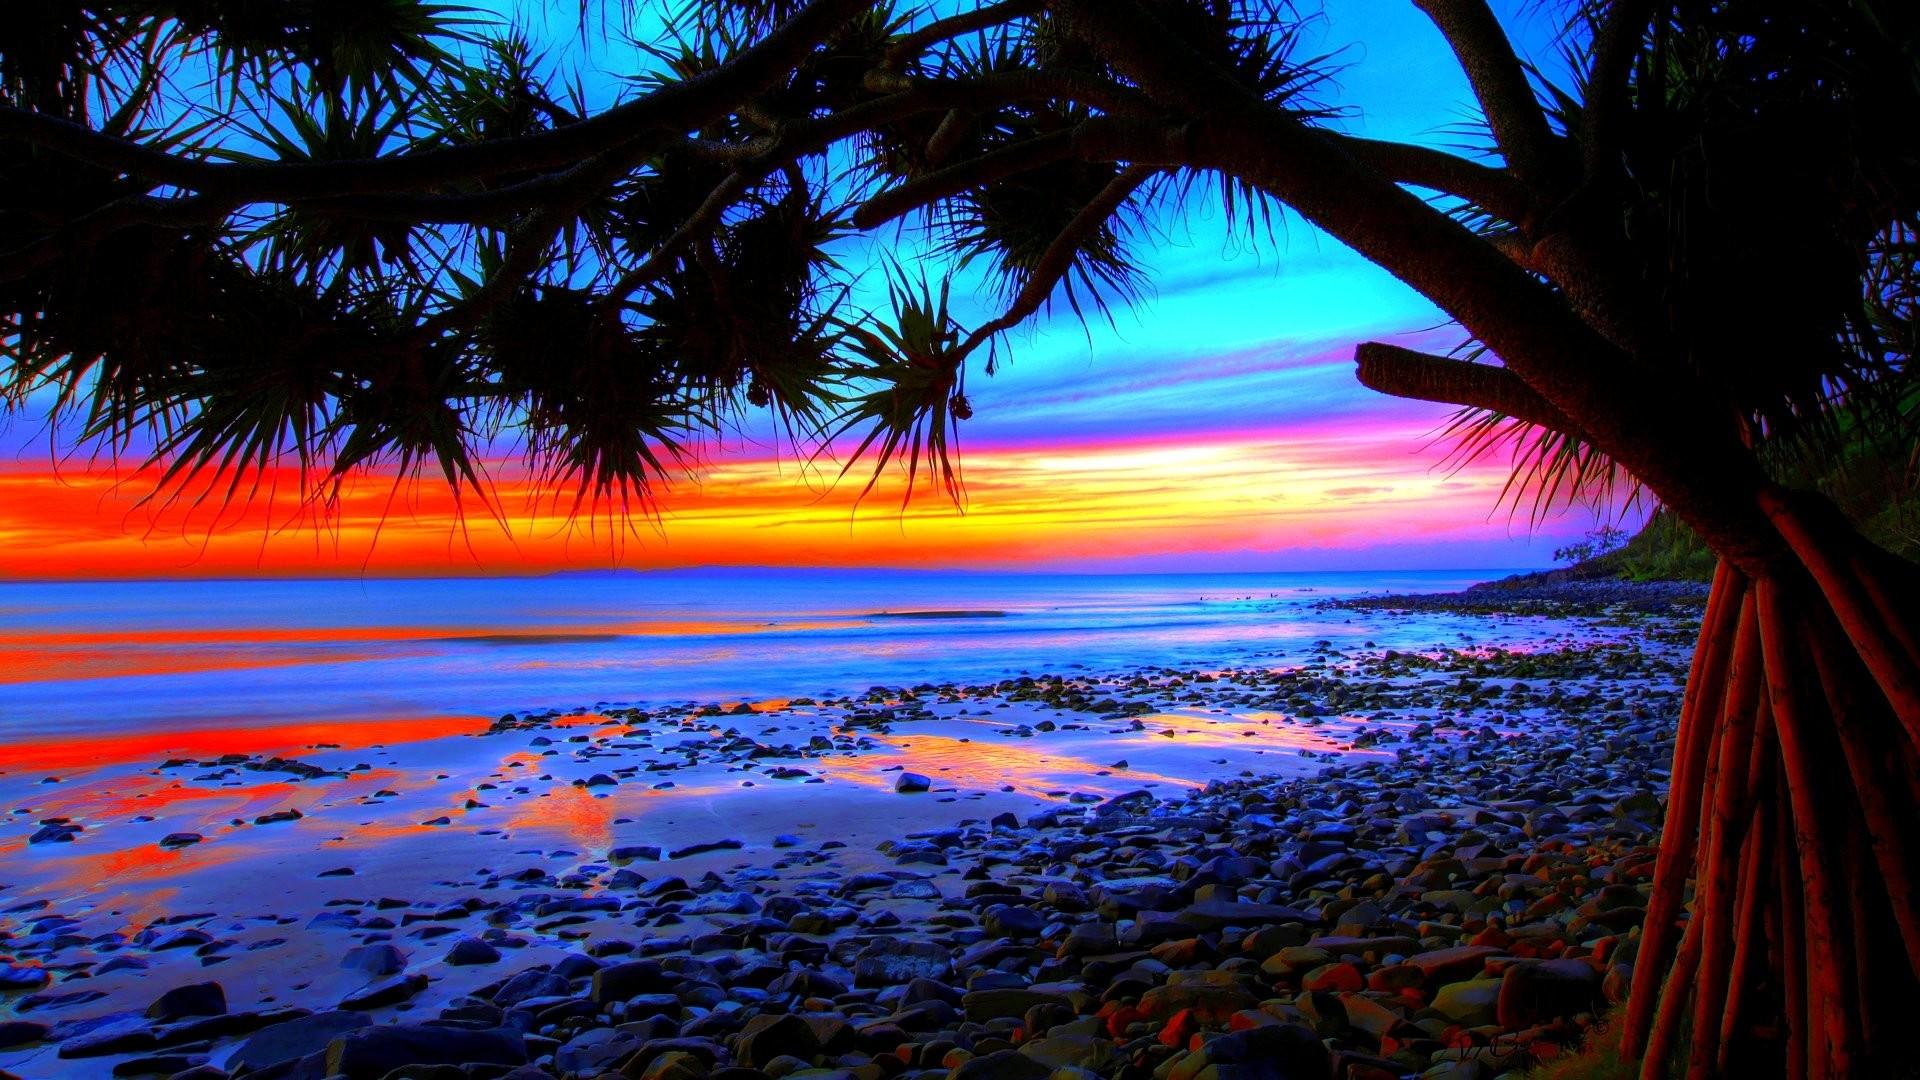 wallpaper-sunset-background-beach-wallpapers-beaches-high-images-definition.jpg  (1920×1080)   Florida   Pinterest   Beach wallpaper, Wallpaper and Beach